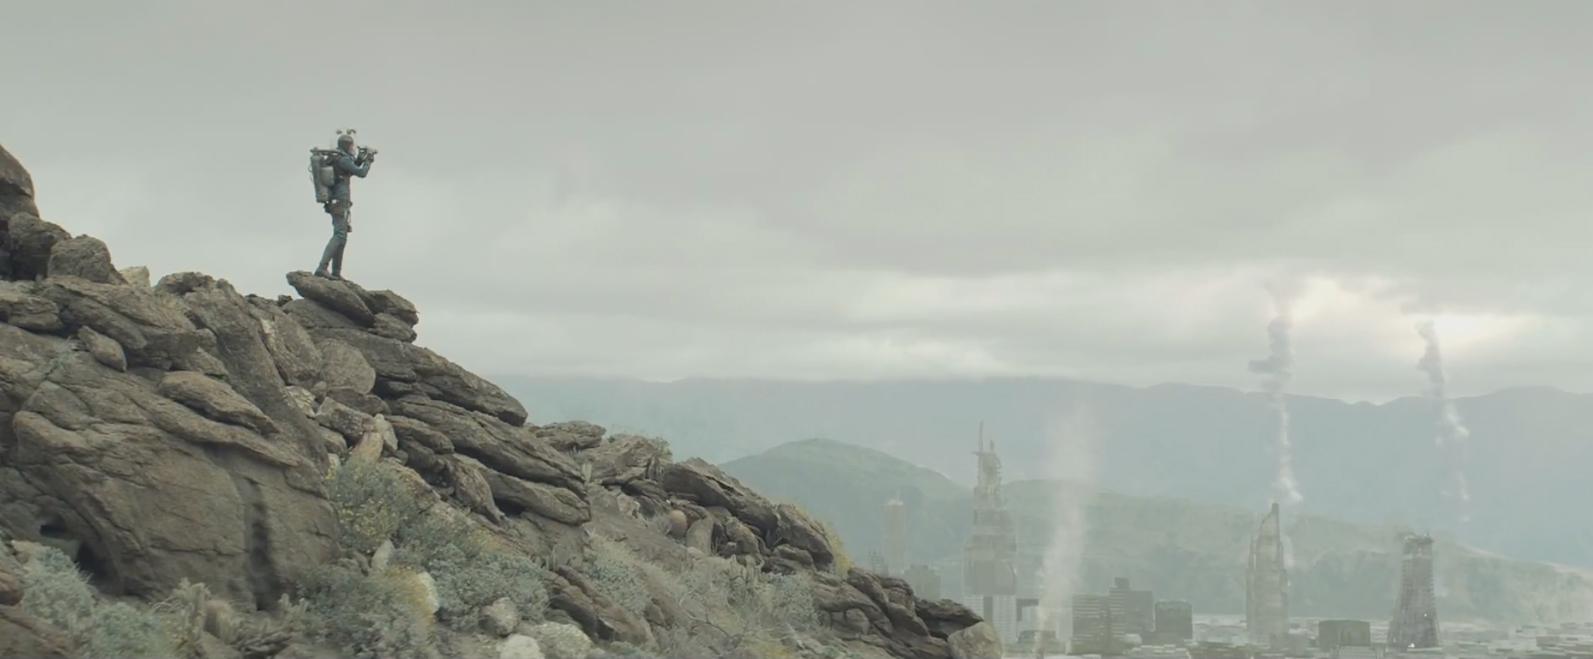 Owl City 8.jpg